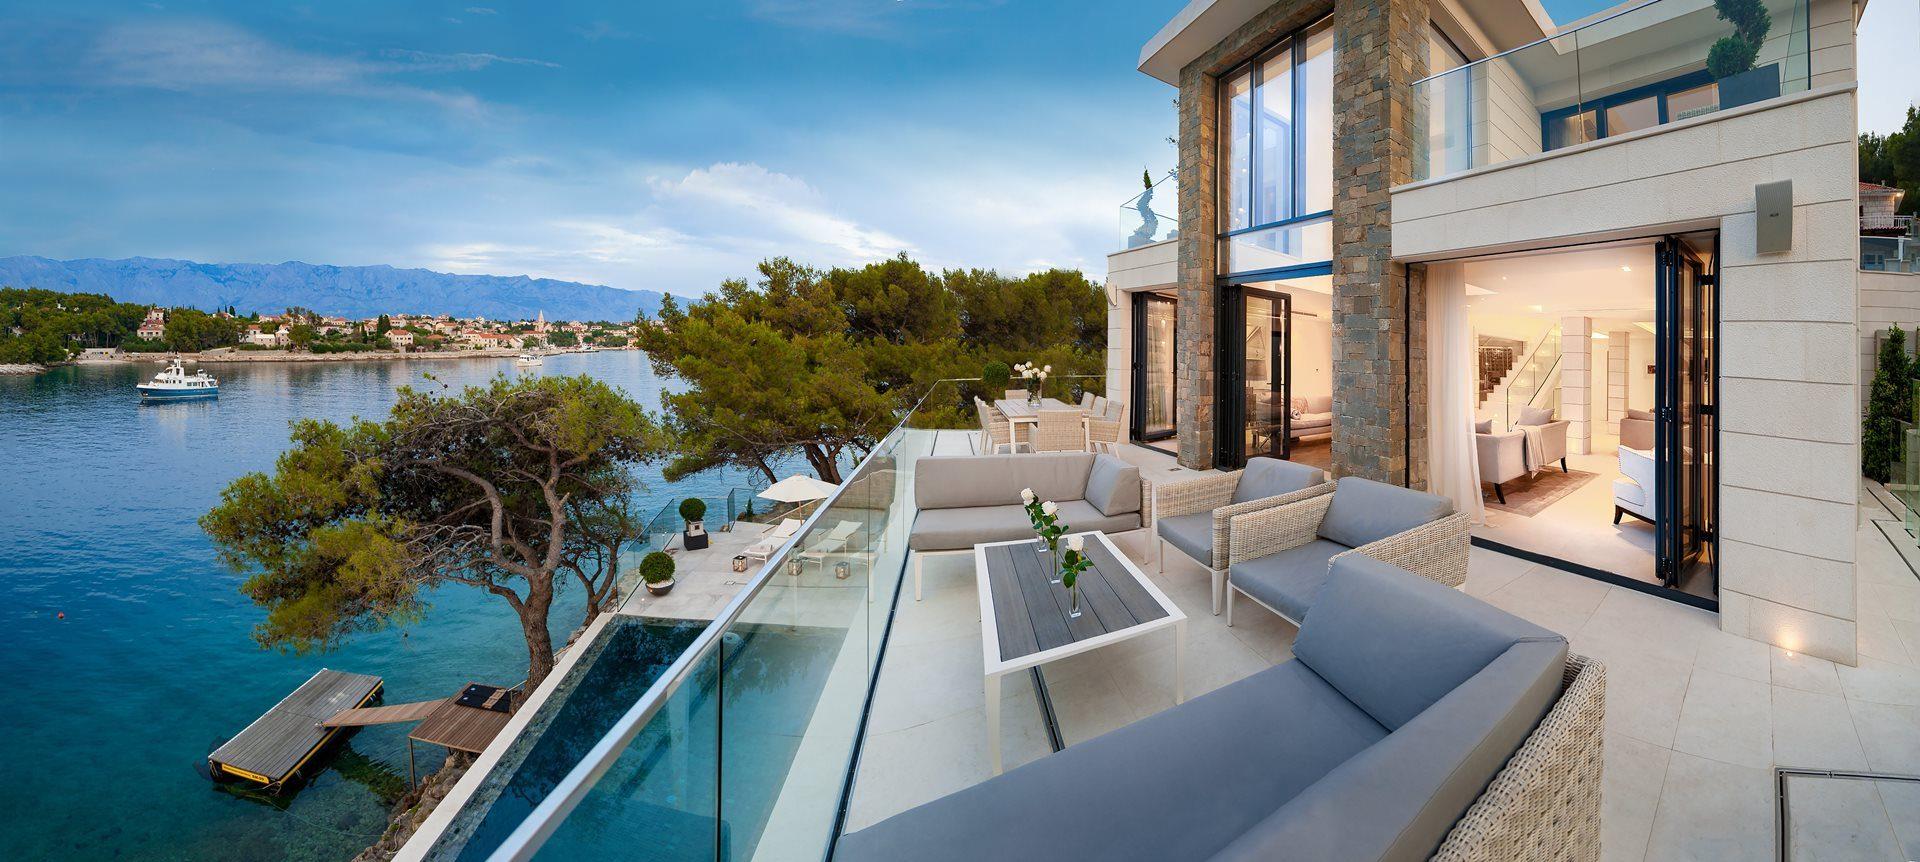 1_Villa-Violet_Sumartin_terrace